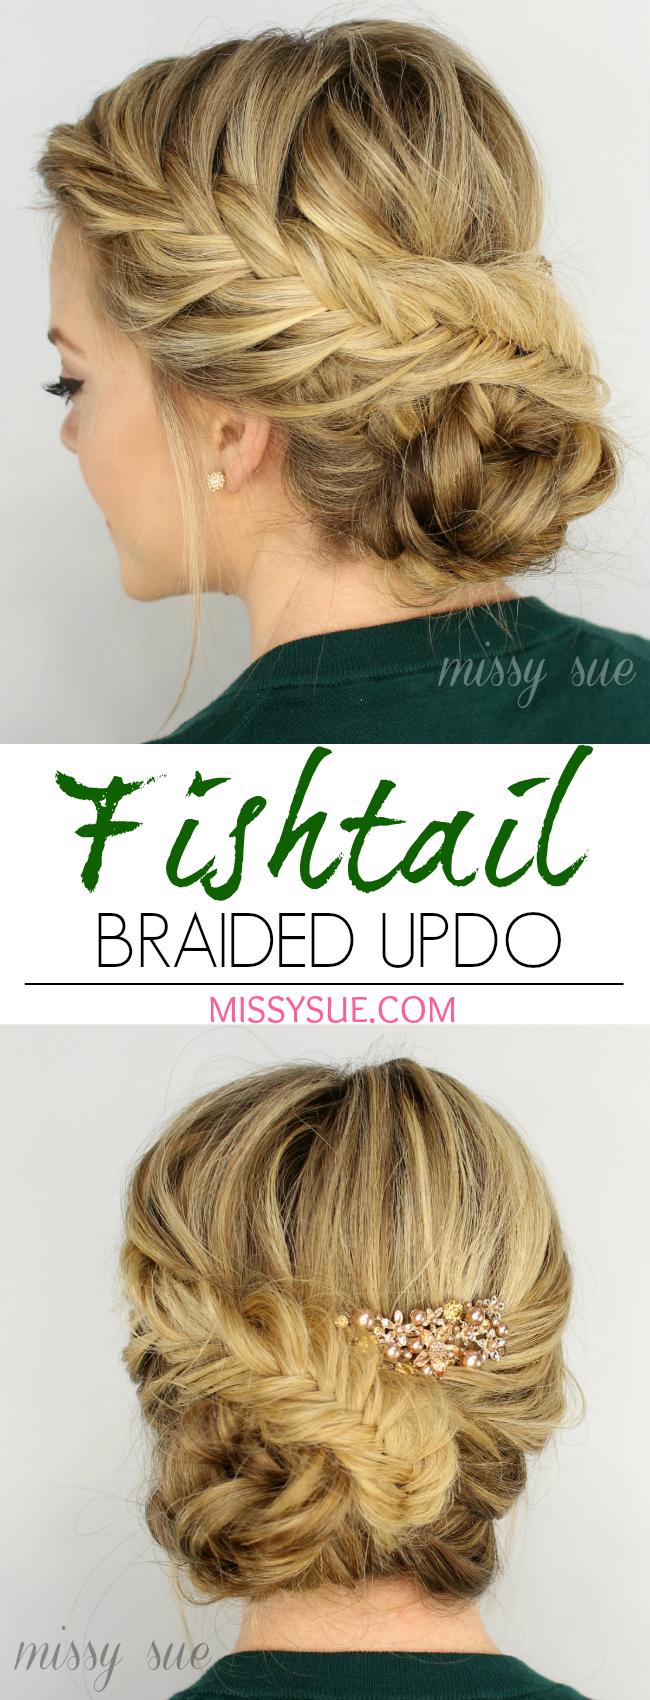 allnew french braid updo hairstyles pinterest fishtail